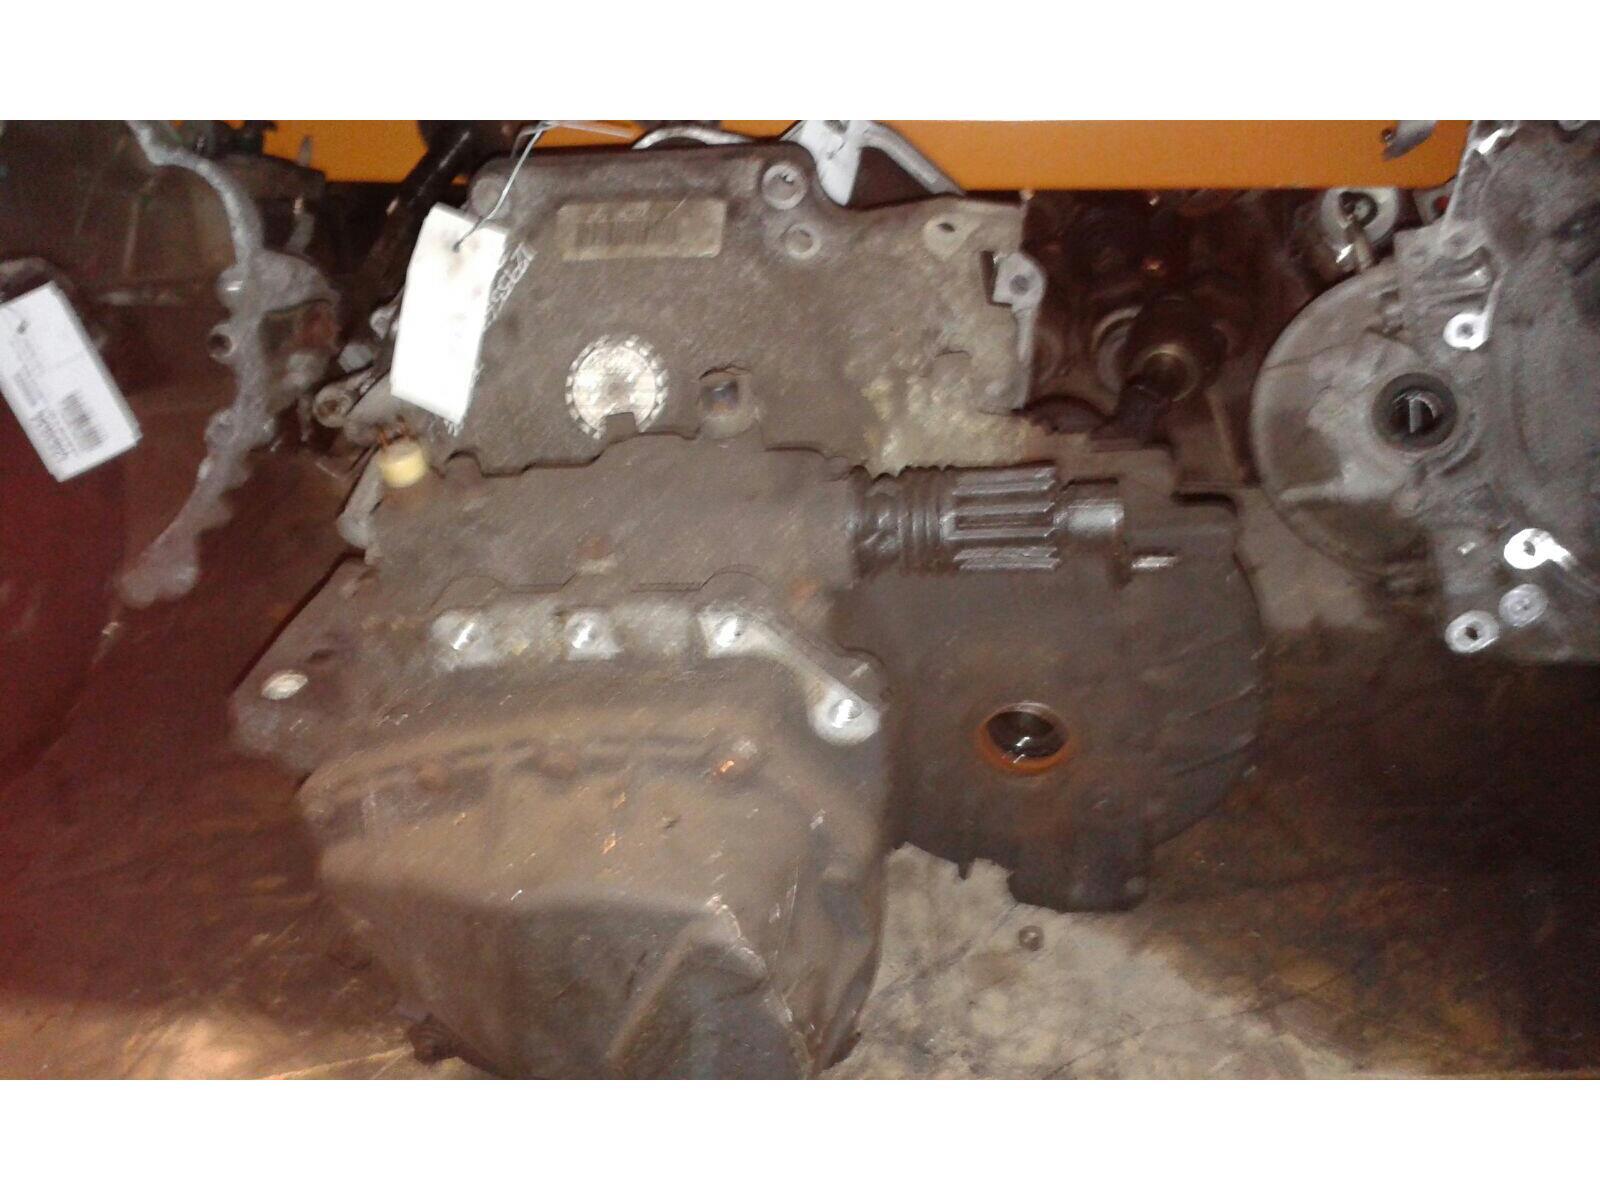 ... GEARBOX Chrysler Voyager 95-08 2.0 16V Petrol 5 Speed Manual & WARRANTY  -1024605 ...